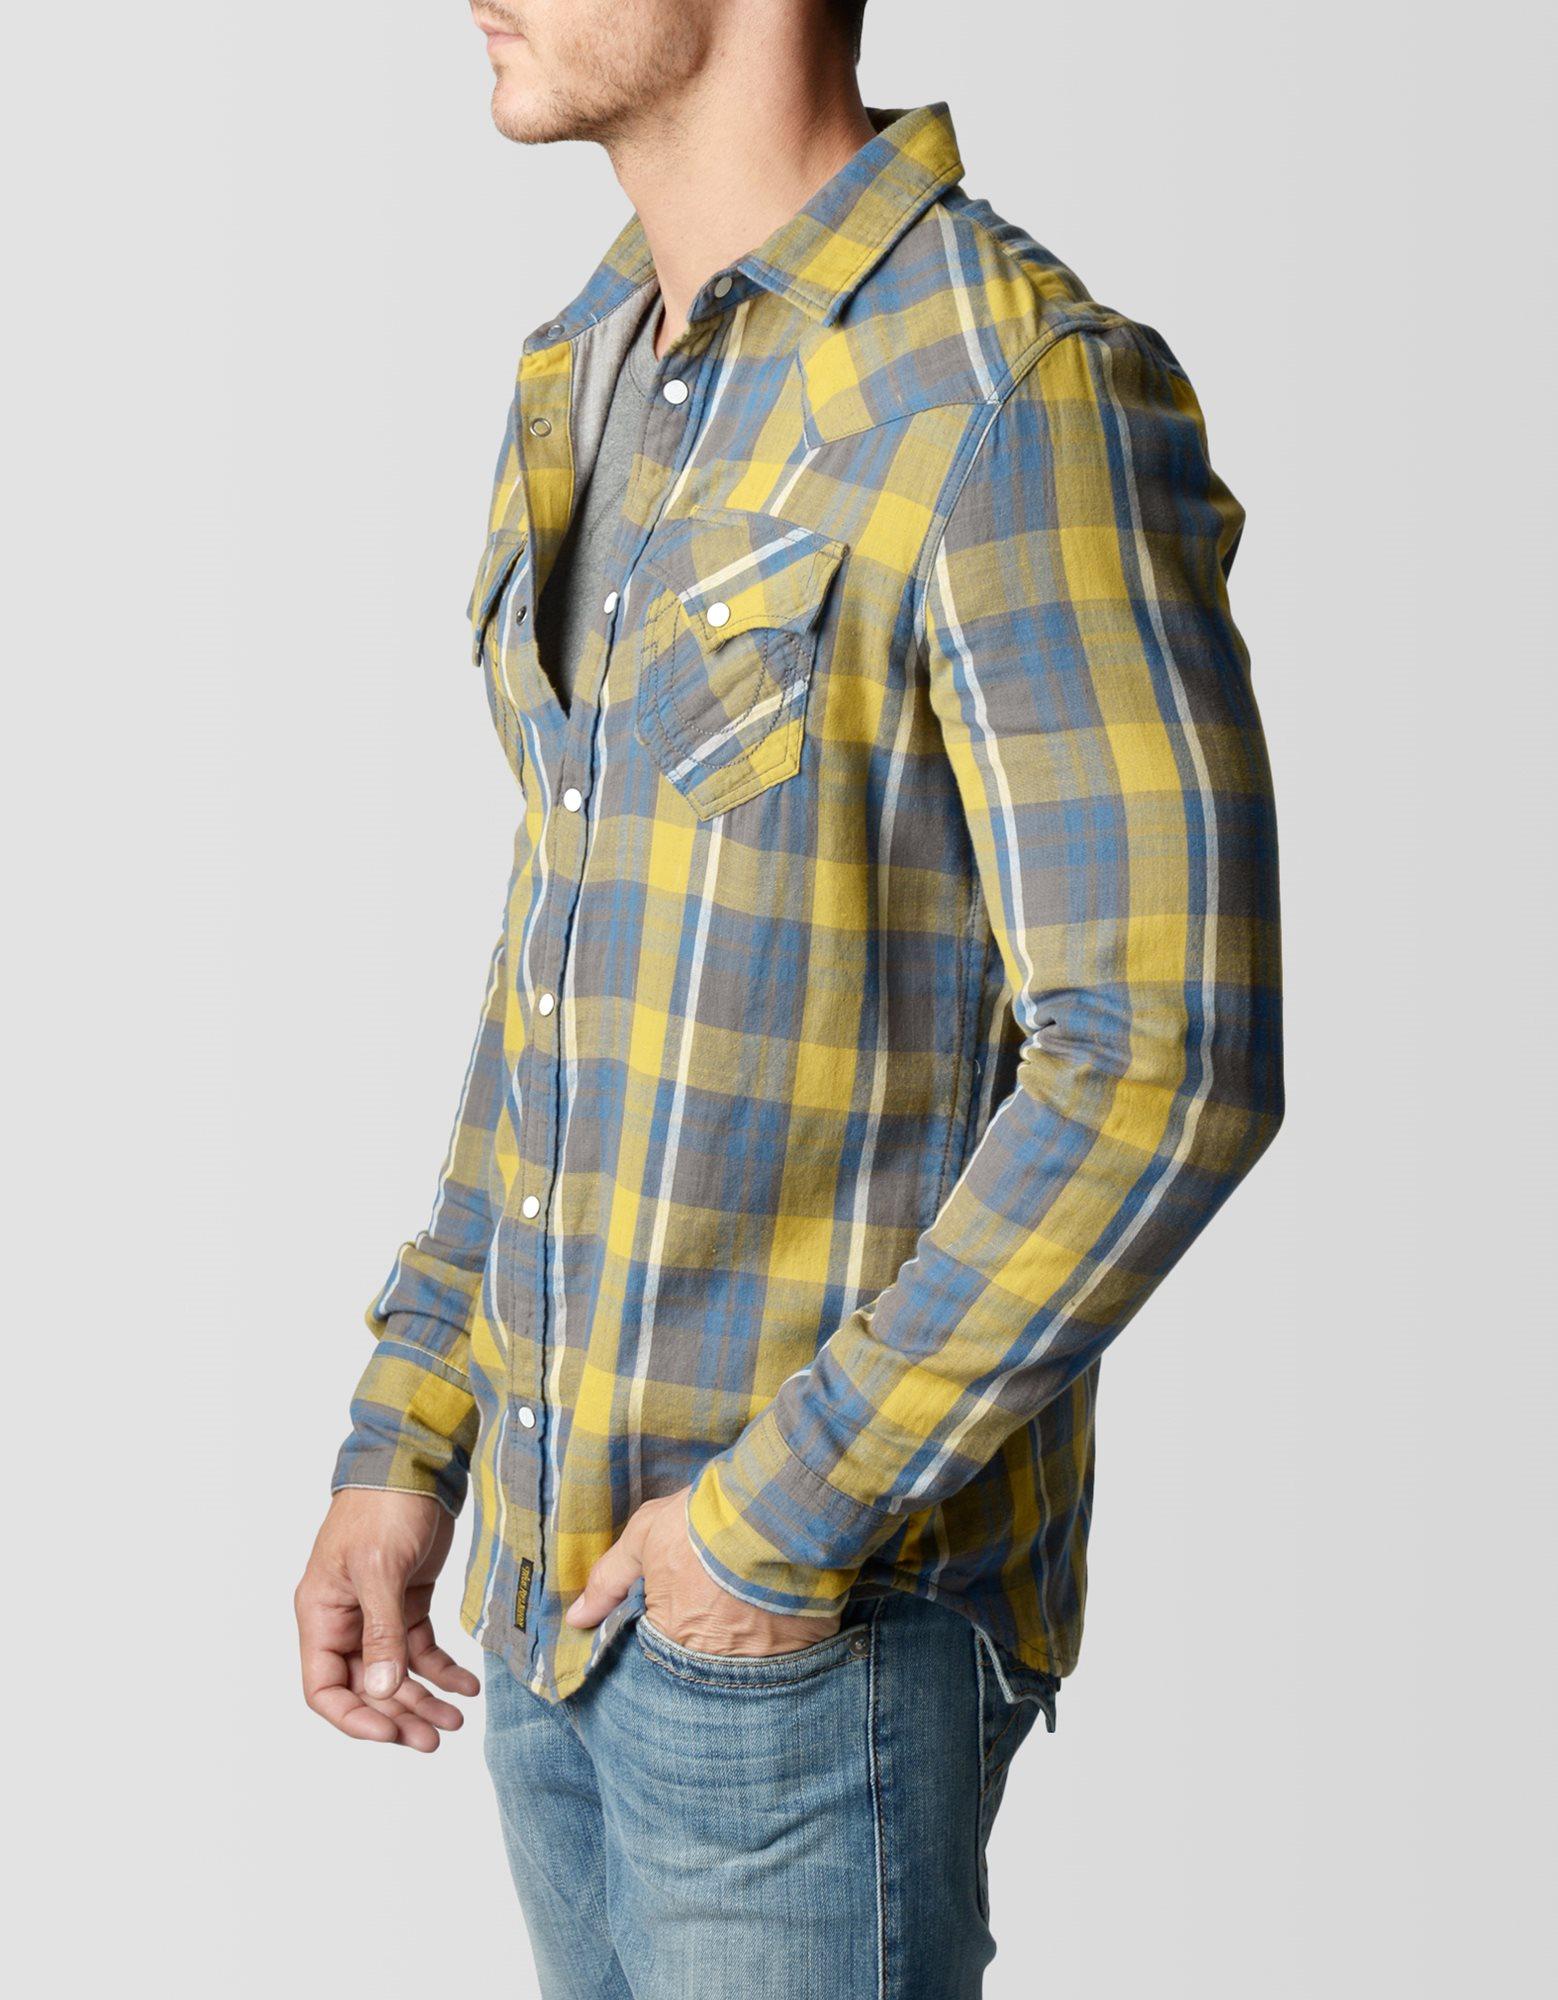 fabulous yellow plaid shirt outfit men men